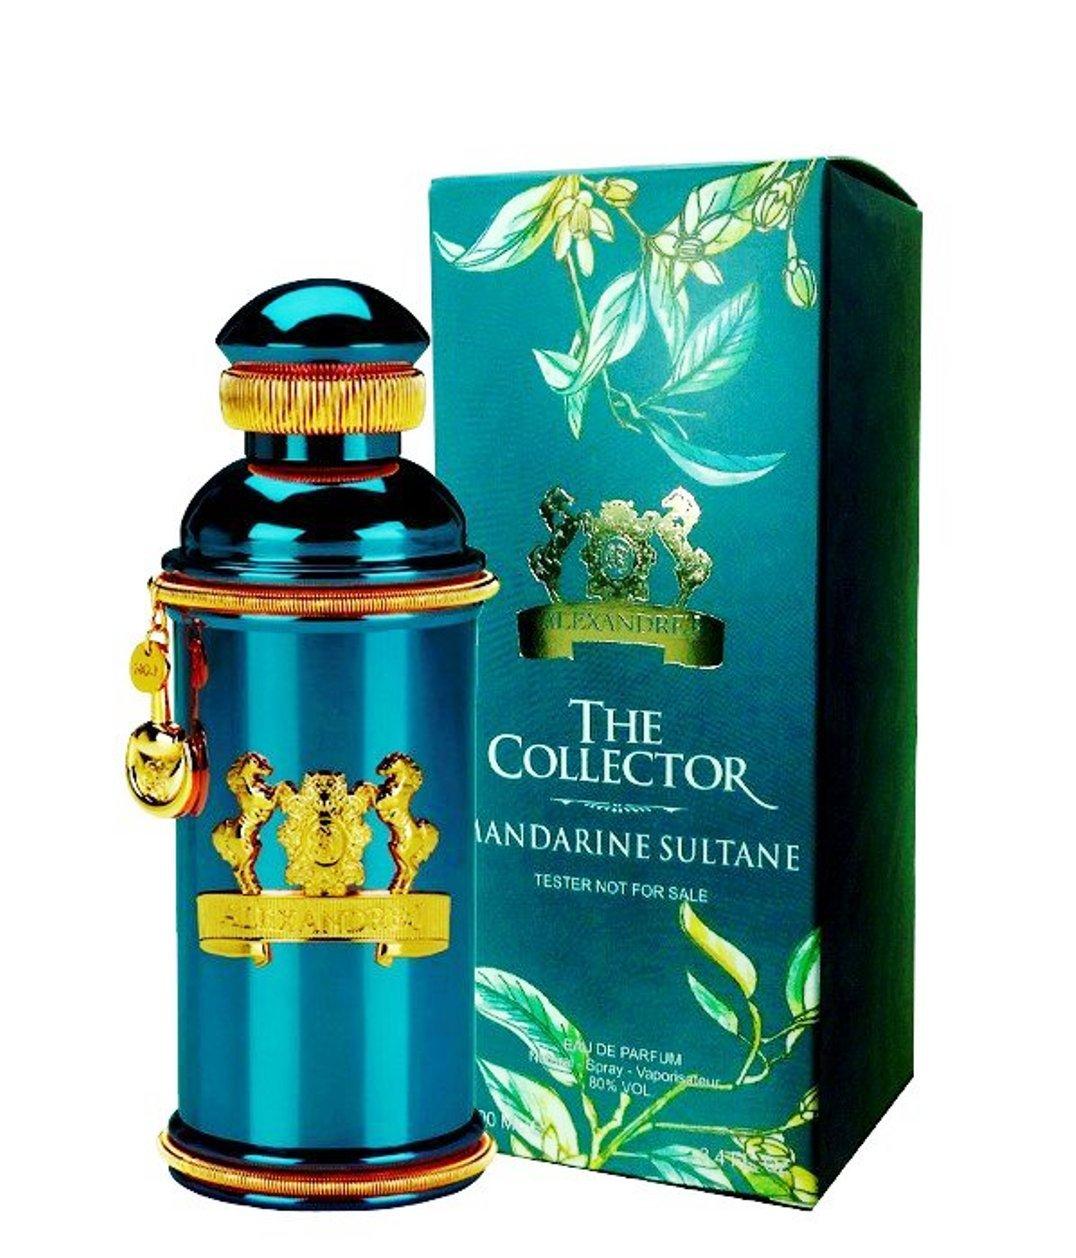 Mandarine Sultane Perfume by Alexándre J 3.4 oz / 100 ml EDP Spray for Women (3512305)